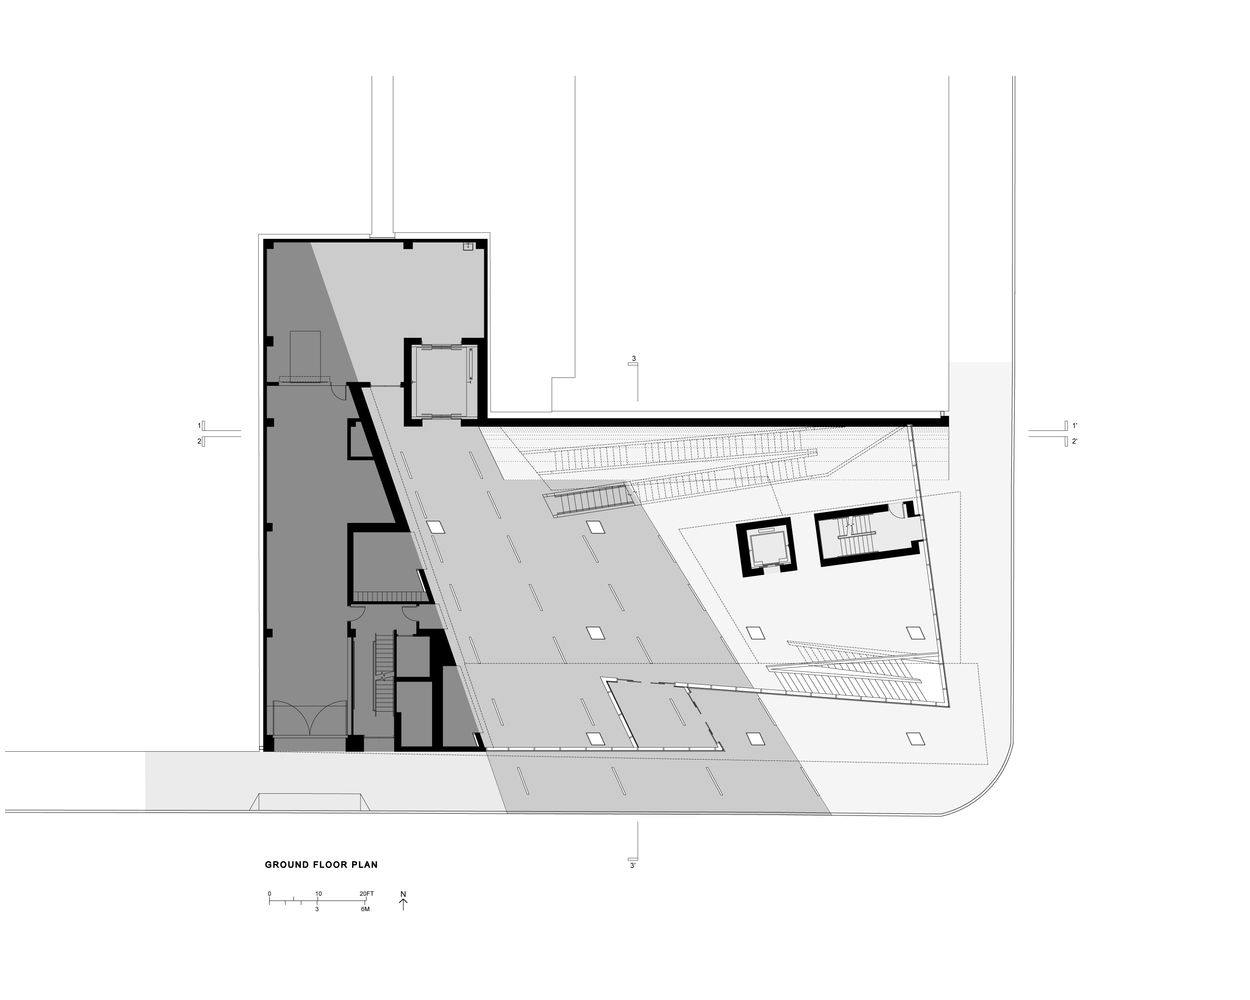 Gallery of AD Classics: Rosenthal Center for Contemporary Art / Zaha ...